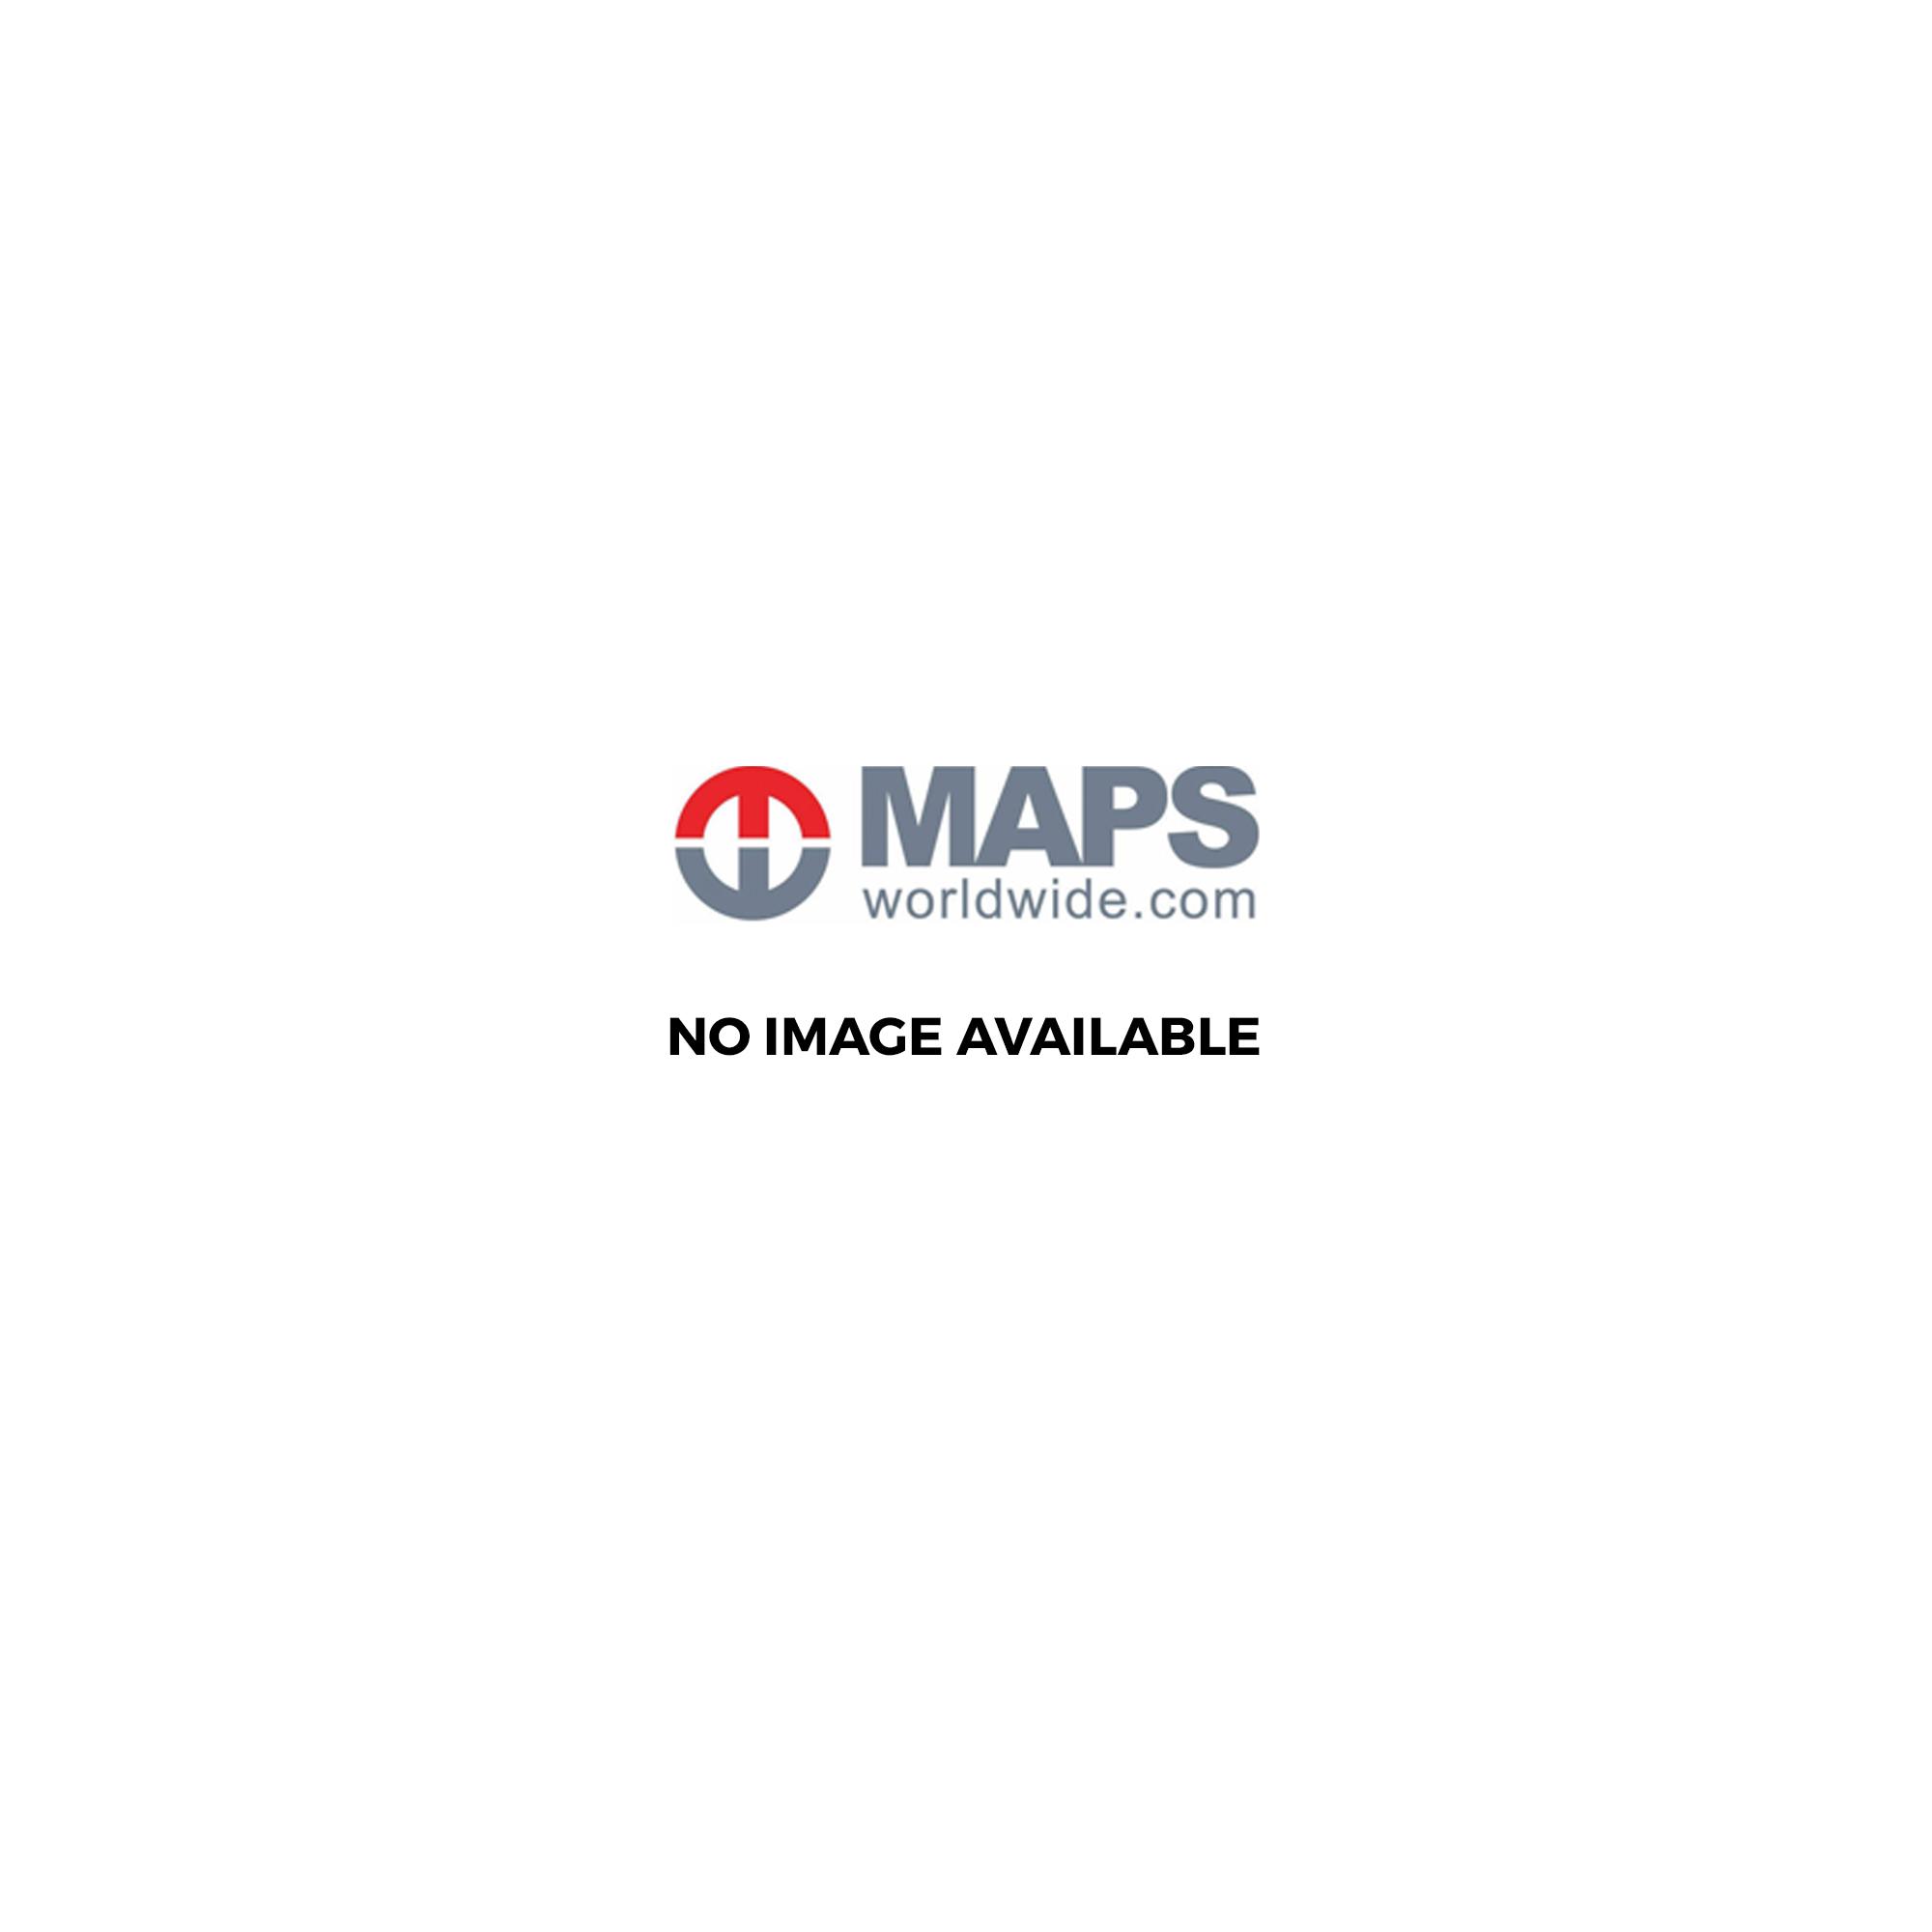 Map Of Italy Showing Tuscany.Michelin Local Maps Of Italy 358 Toscana Tuscany